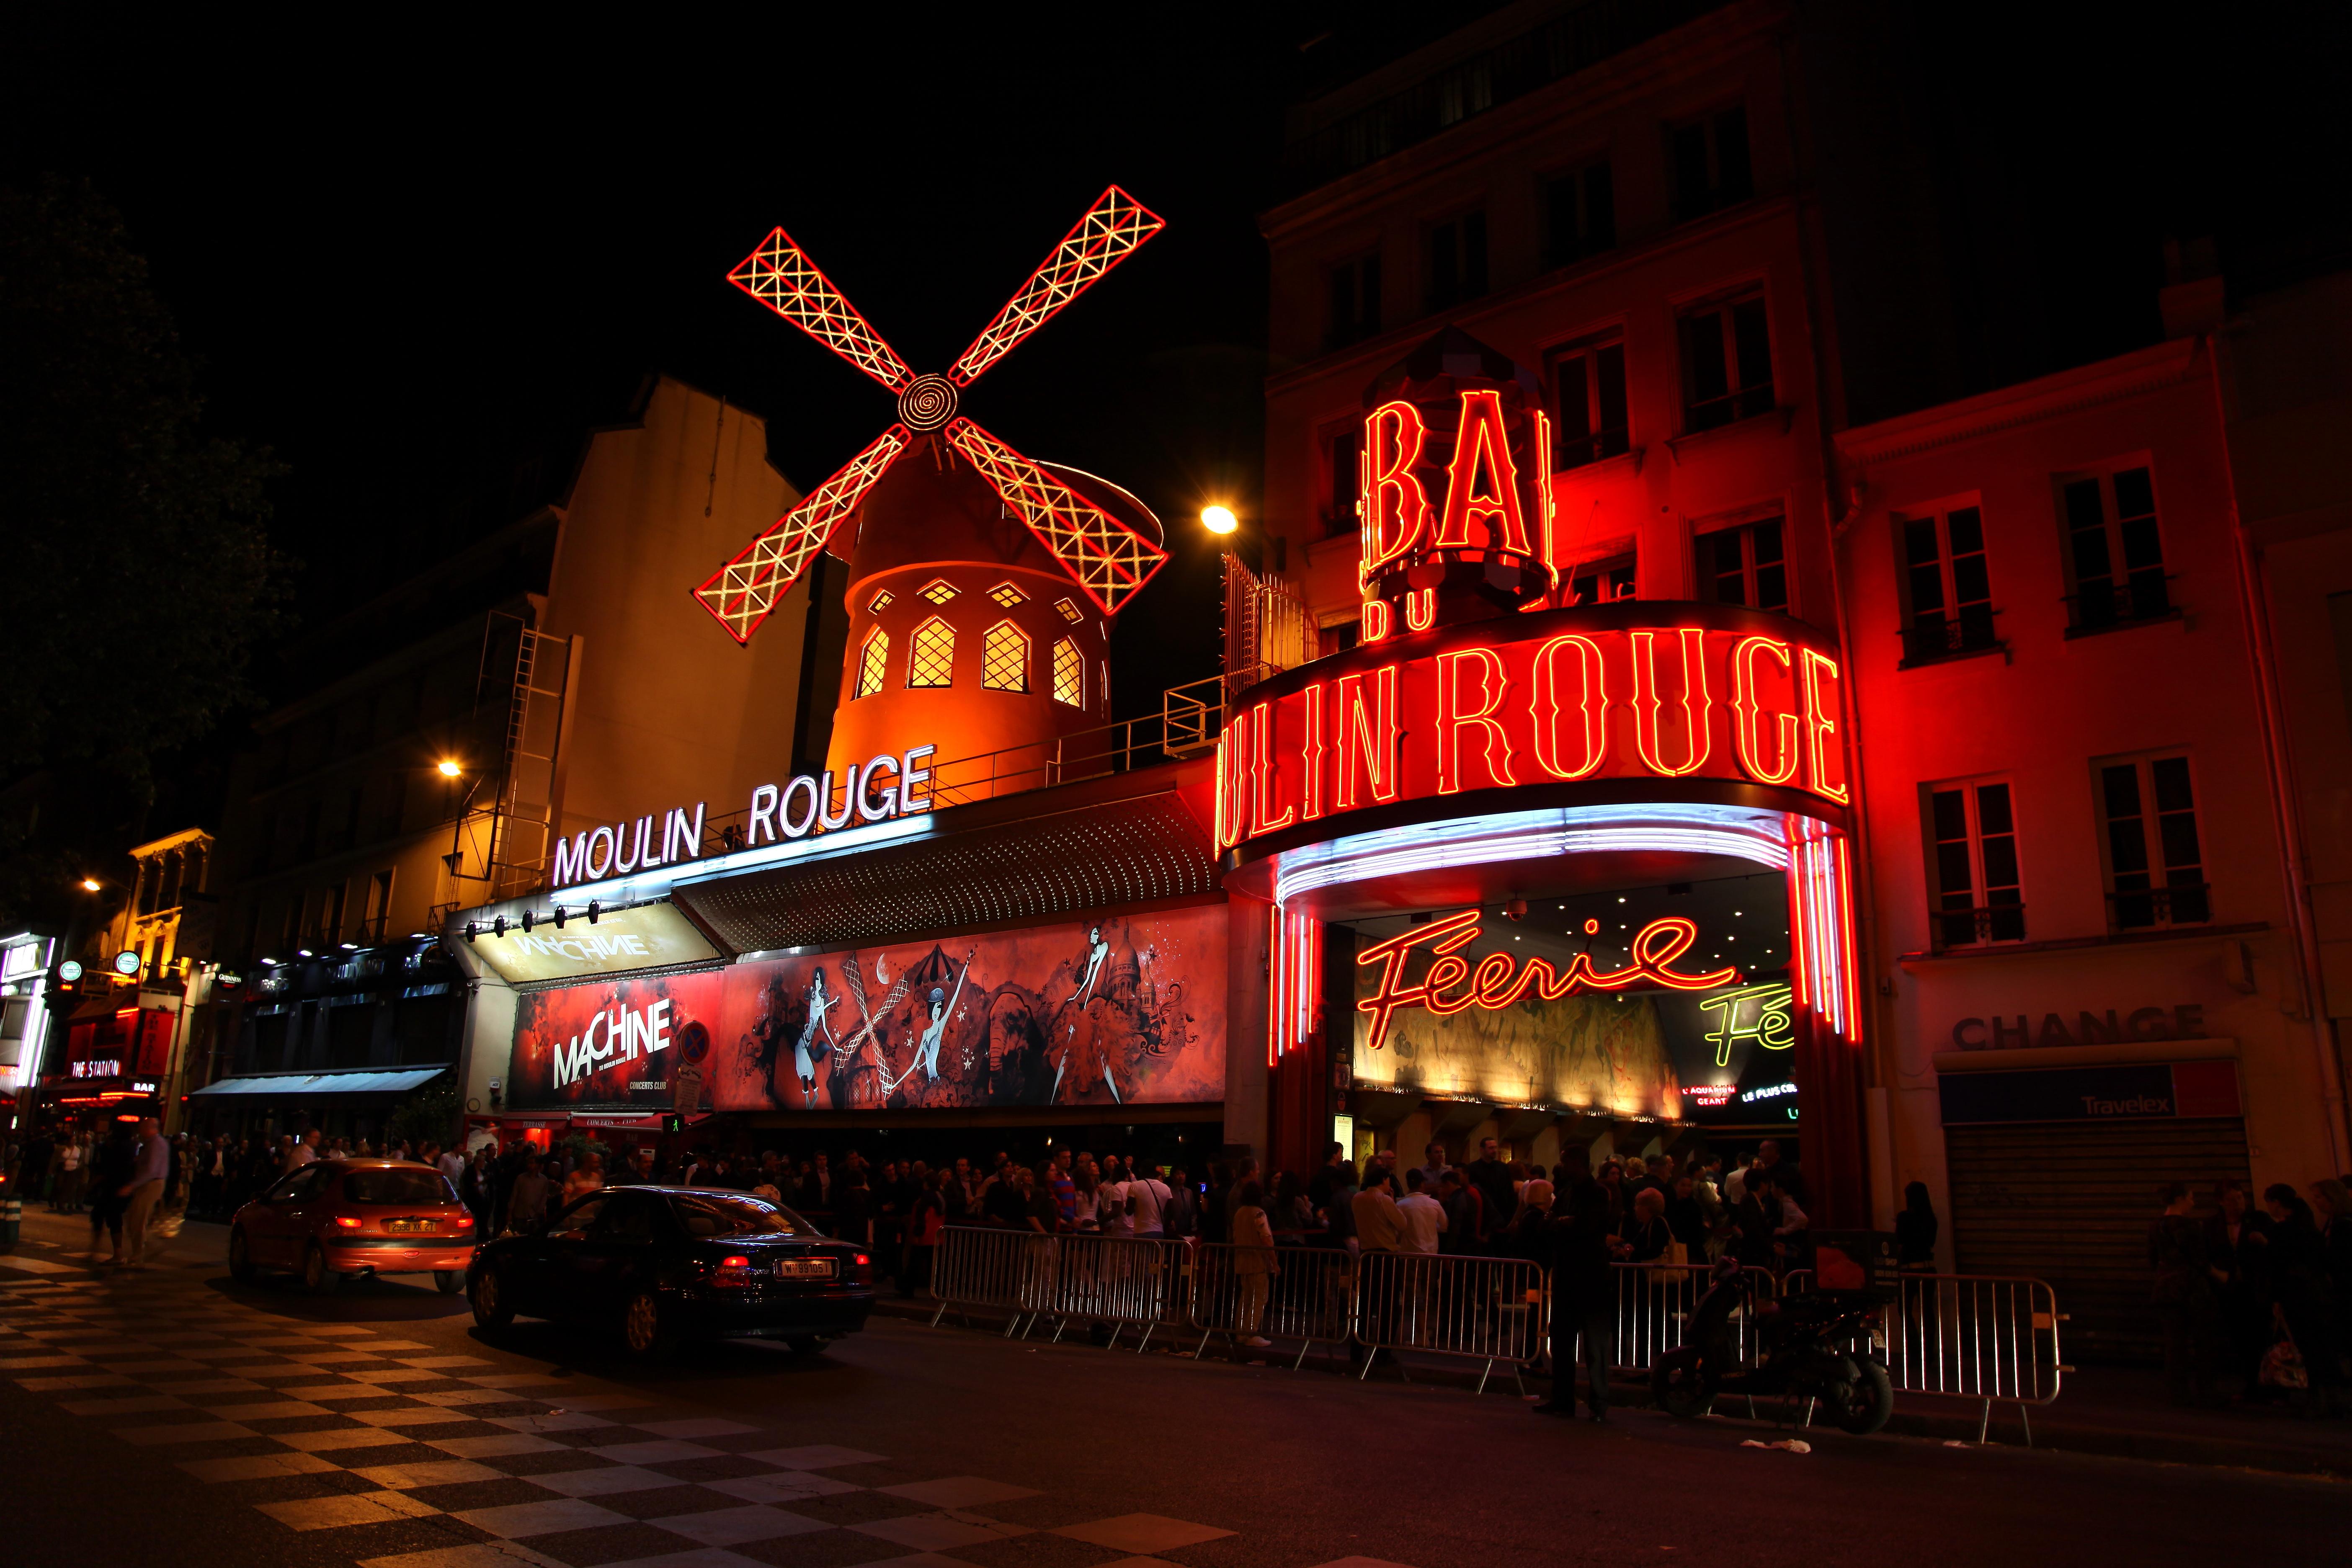 Nightlife of Paris